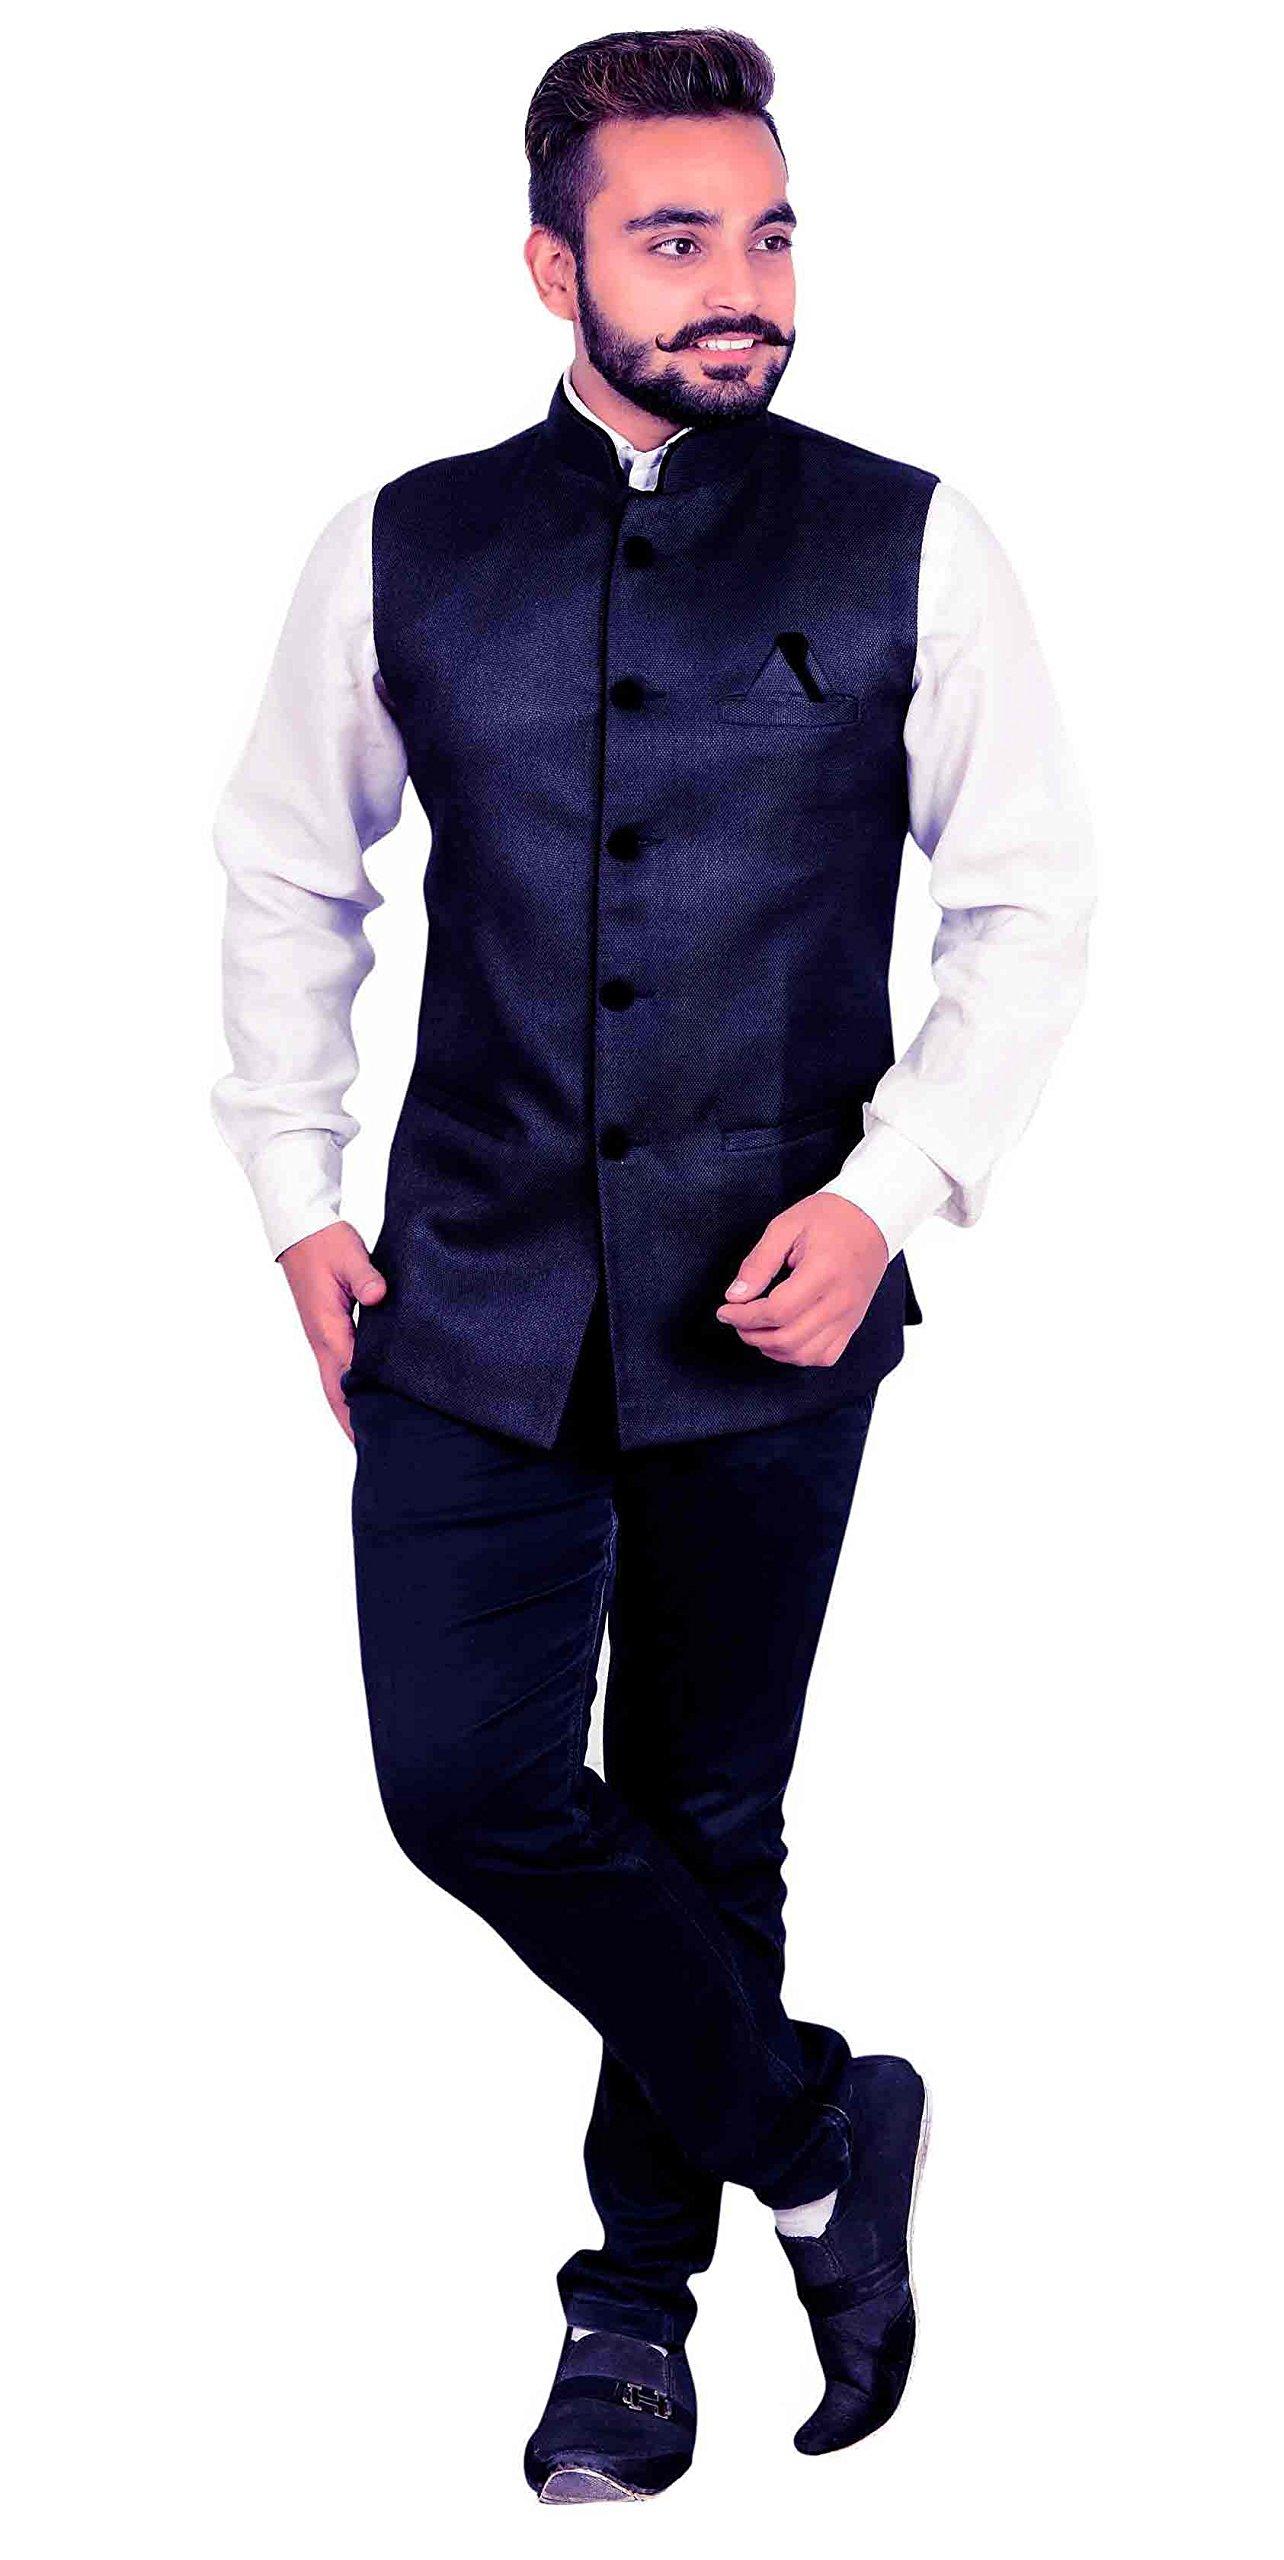 Men's Indian Waistcoat for shalwar kameez for Bollywood theme & wedding party shops London 1006 UK (36 (XS), Navy Blue)